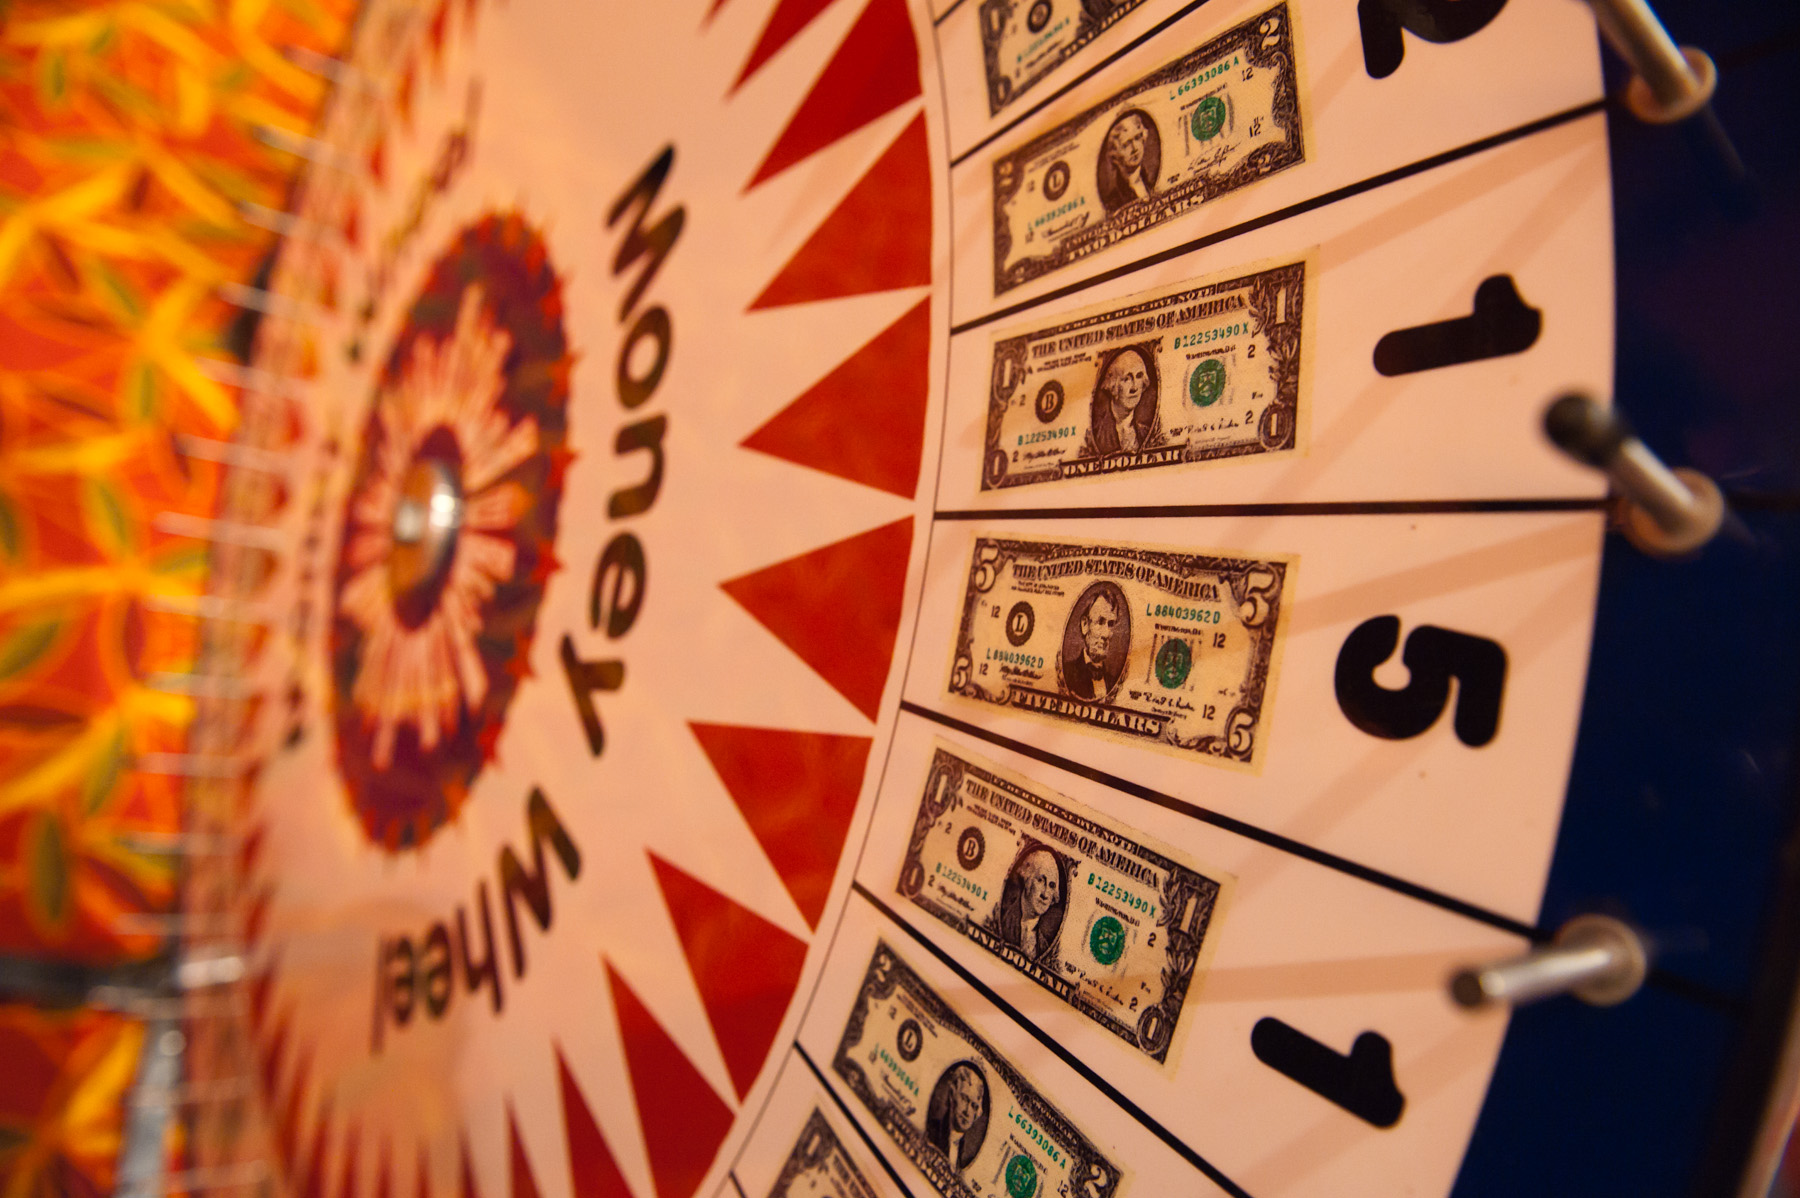 Fun time casino supply co campus gambling